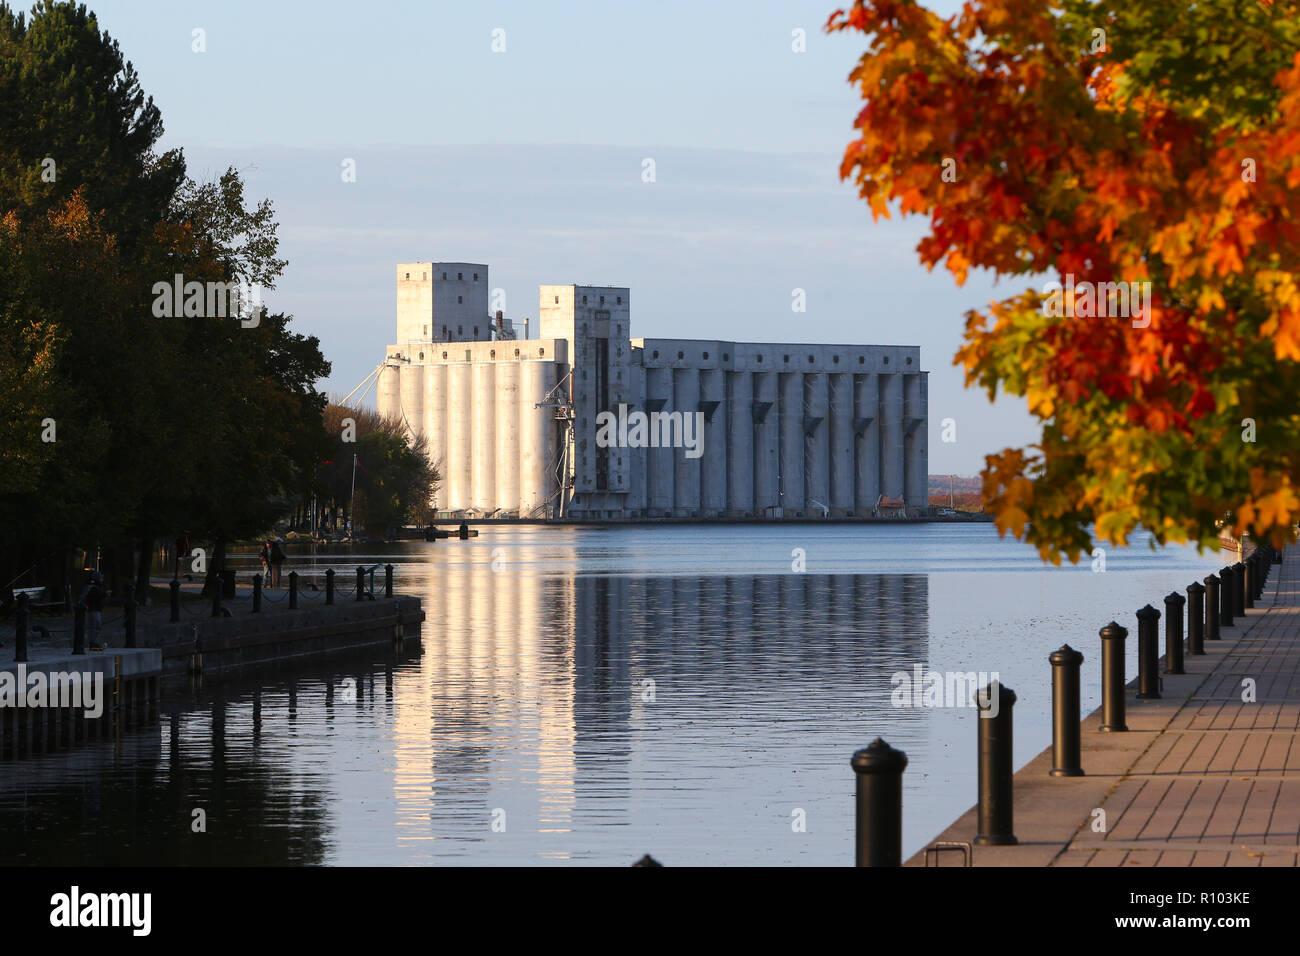 Canada 2018 Stock Photos & Canada 2018 Stock Images - Alamy